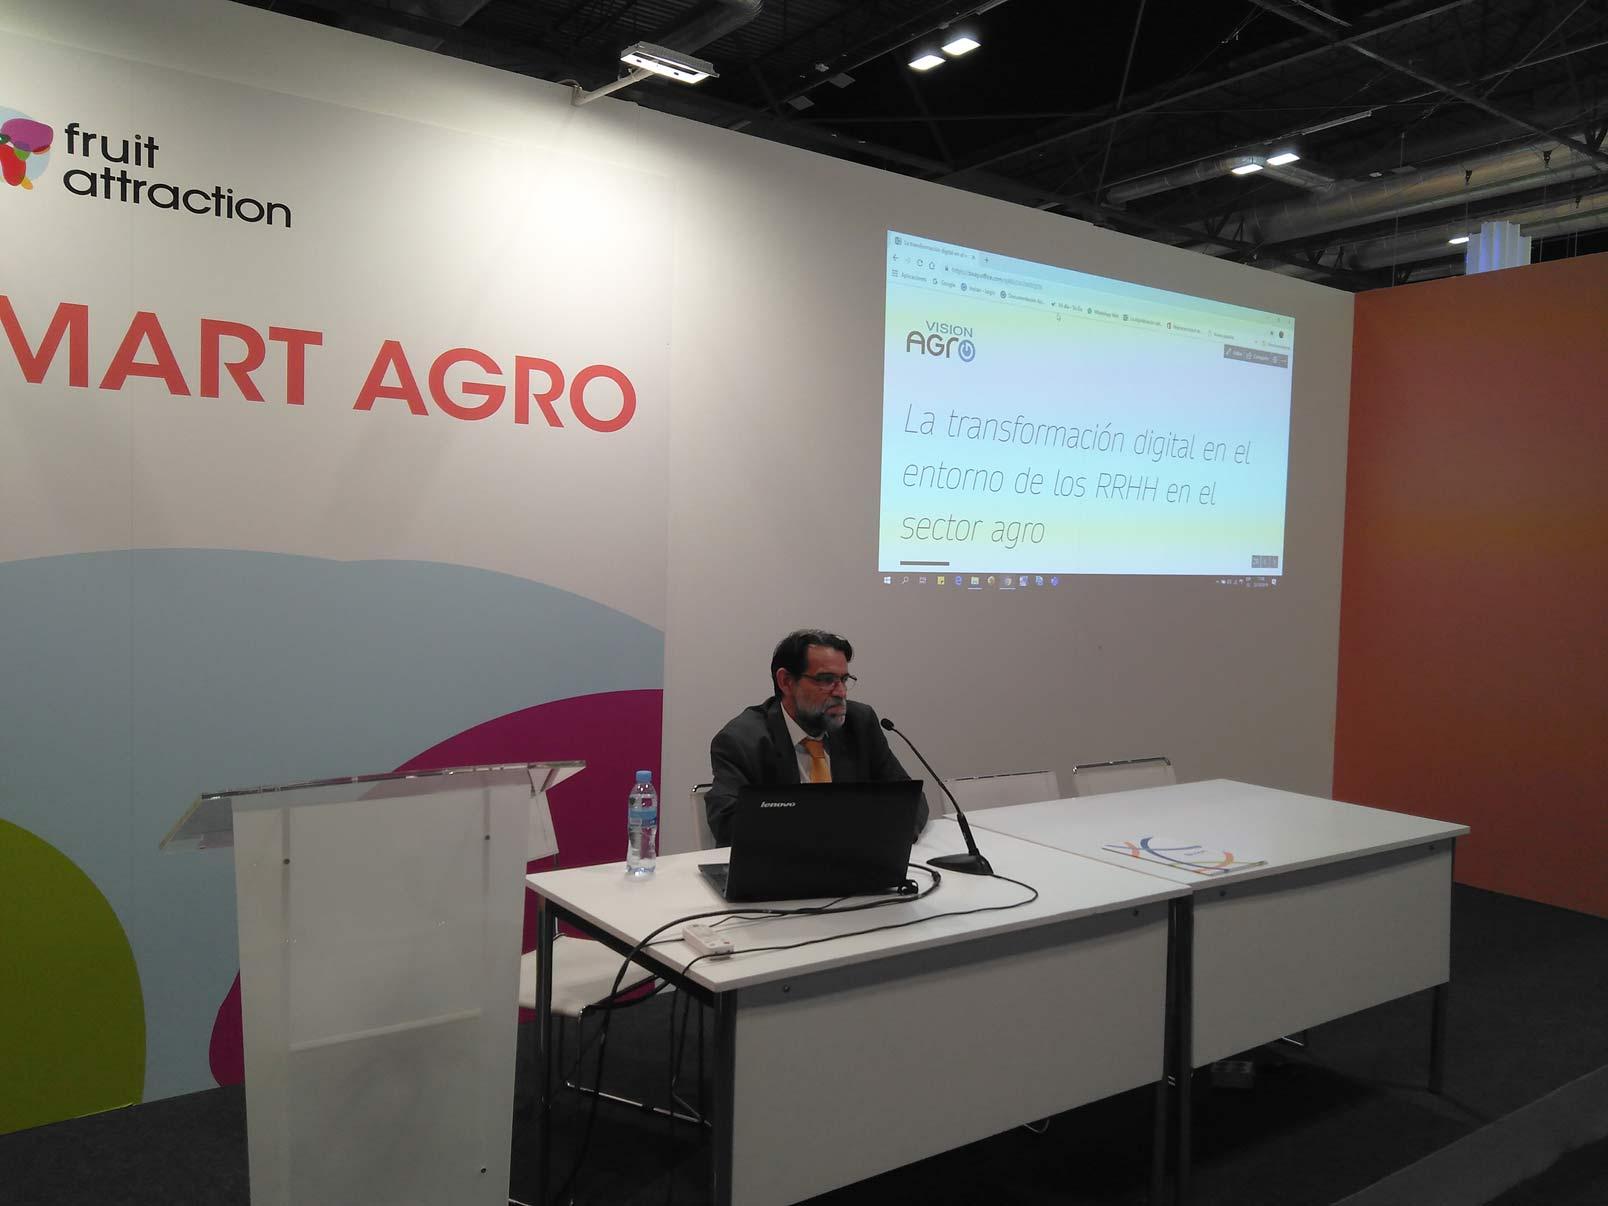 Fruit-Attraction-2021---foro-smart-agro---ERP-agro